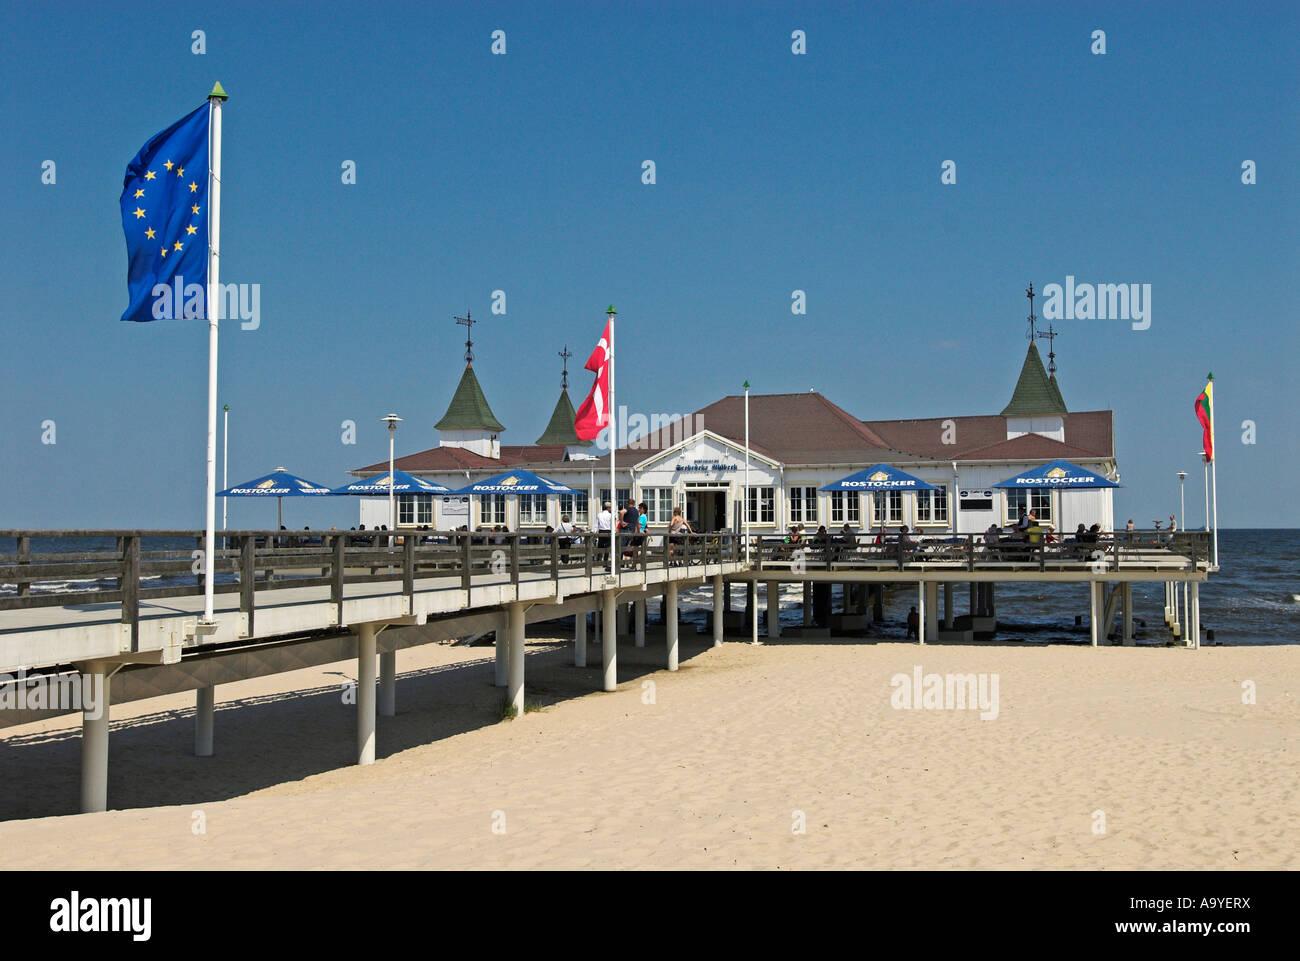 Wooden pier in Ahlbeck, Usedom island, Mecklenburg Western Pomerania, Germany, Europe Stock Photo